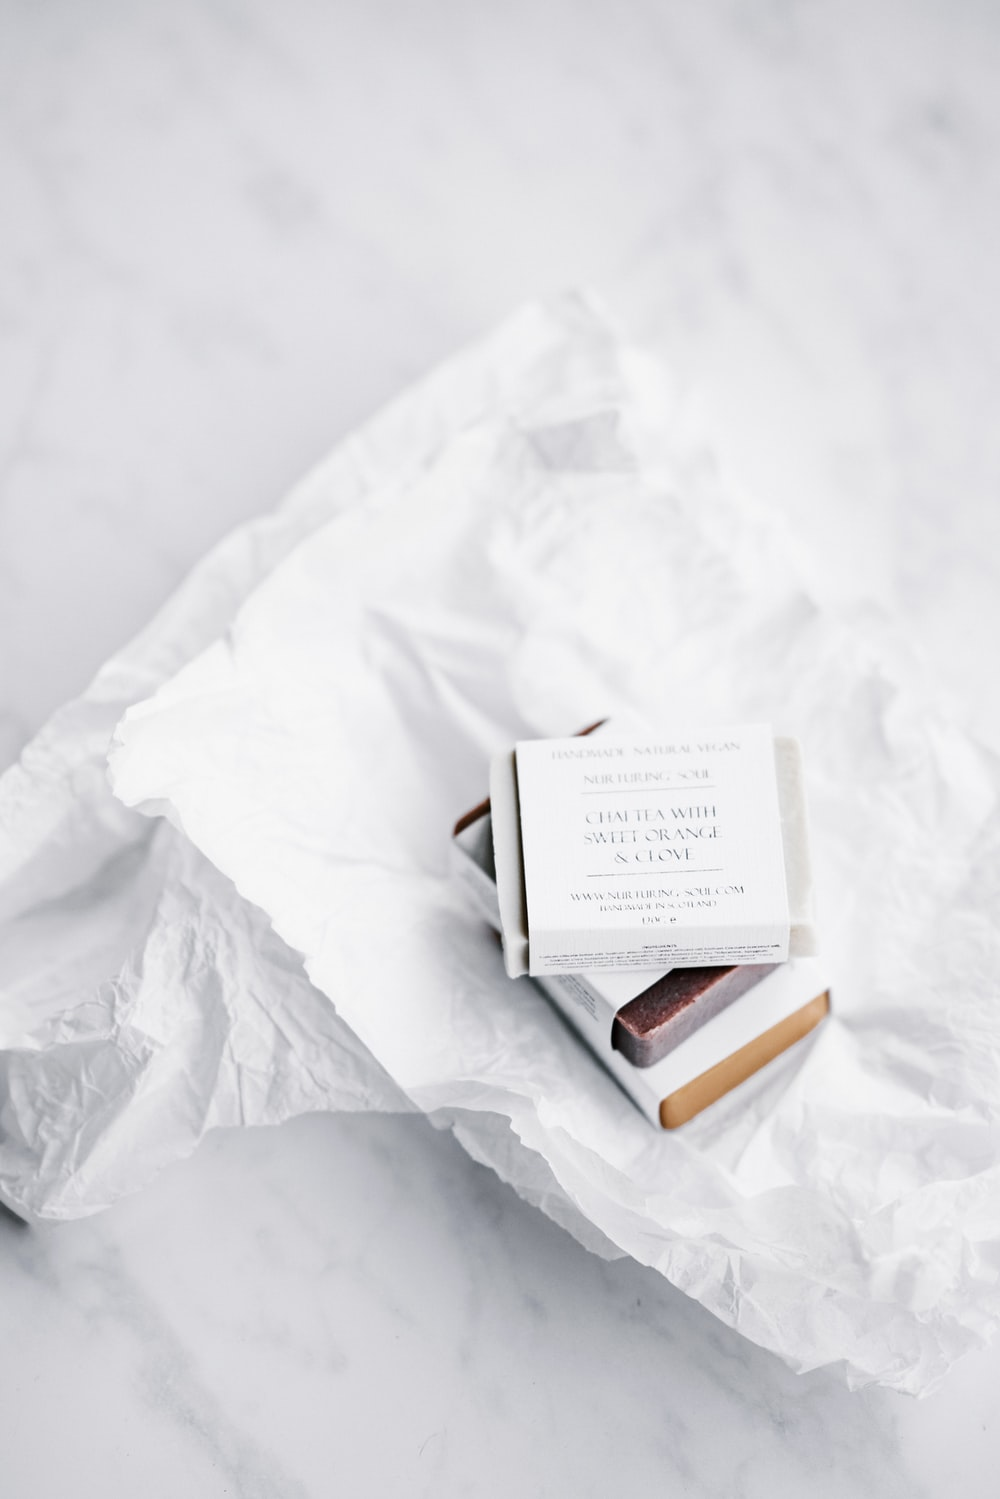 white labeled box on white printer paper